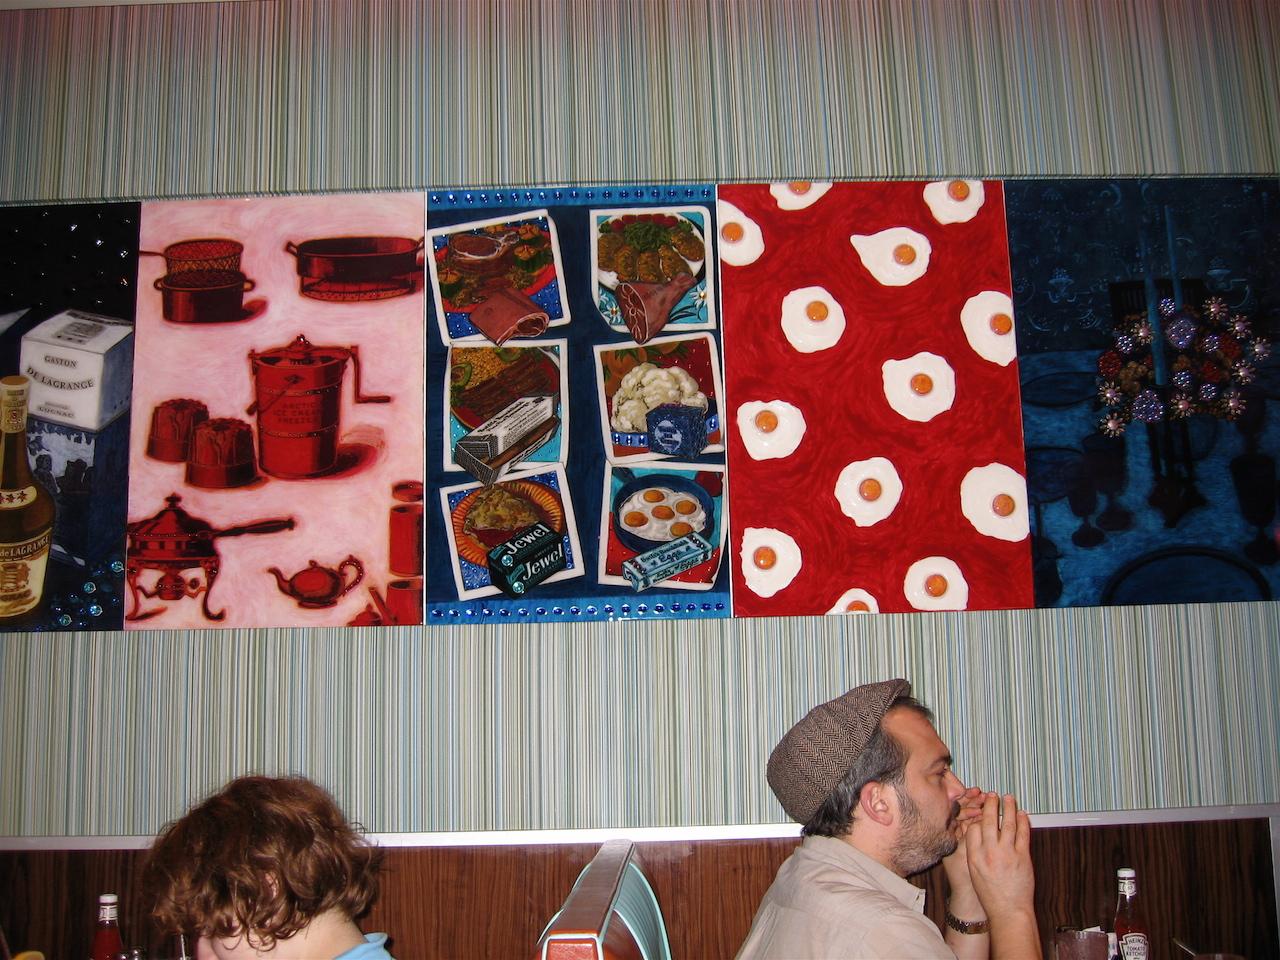 The Good Stuff Diner